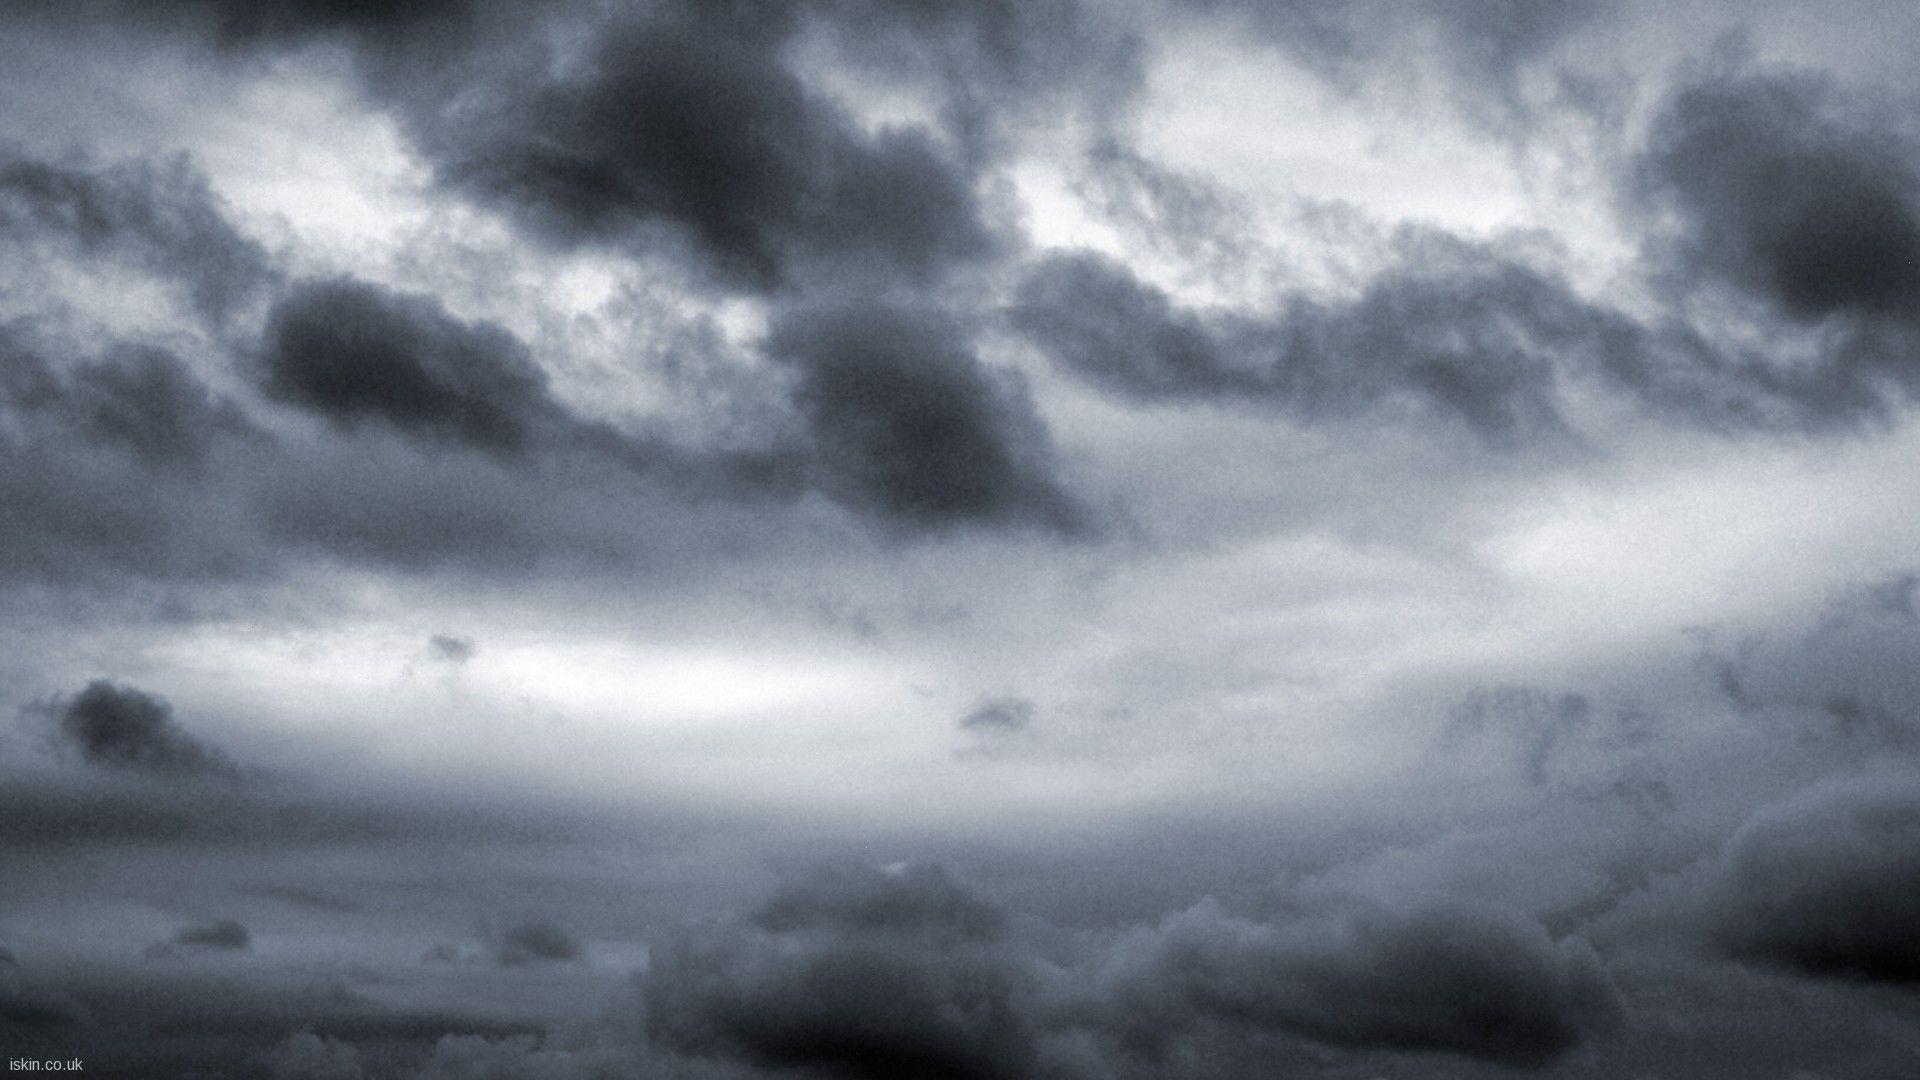 Nature: Stormy Sky, desktop wallpaper nr. 58501 by iskin